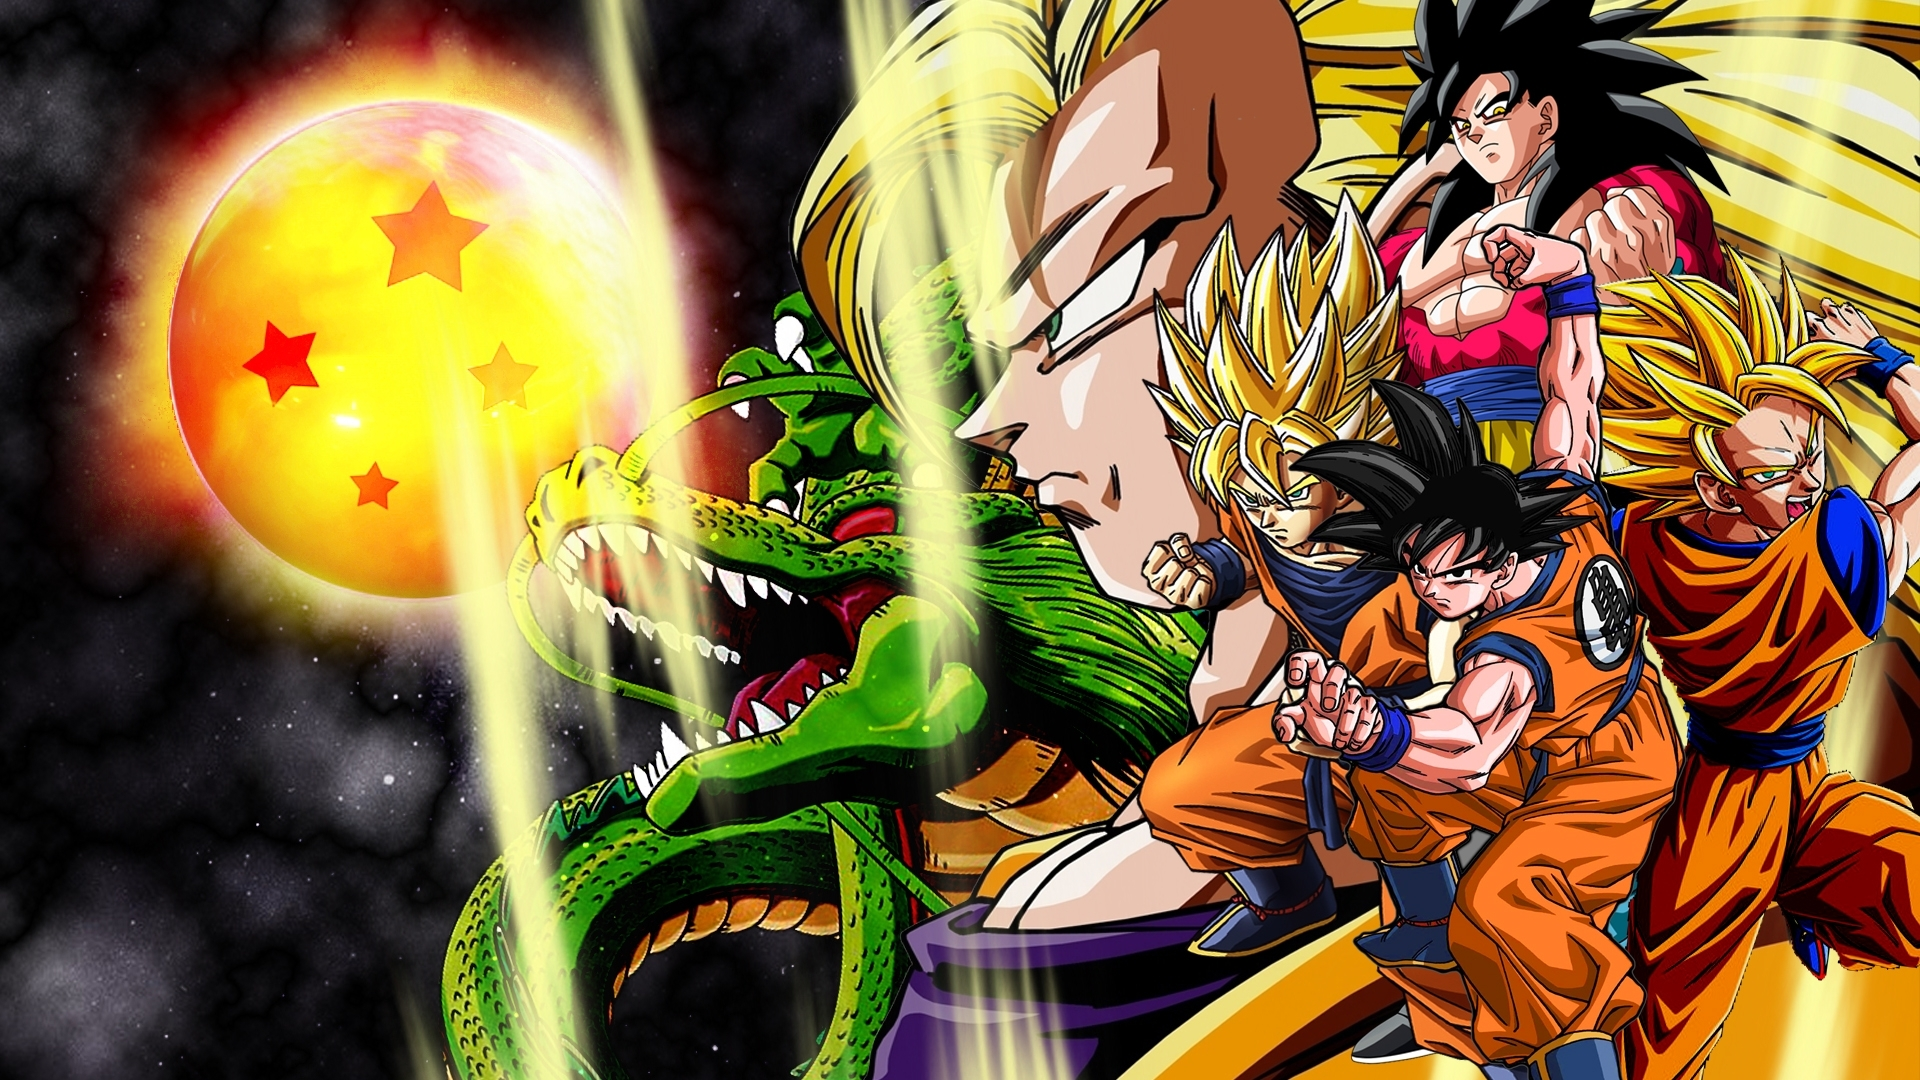 top 20 des plus grands combats de dragon ball (z, super) | le